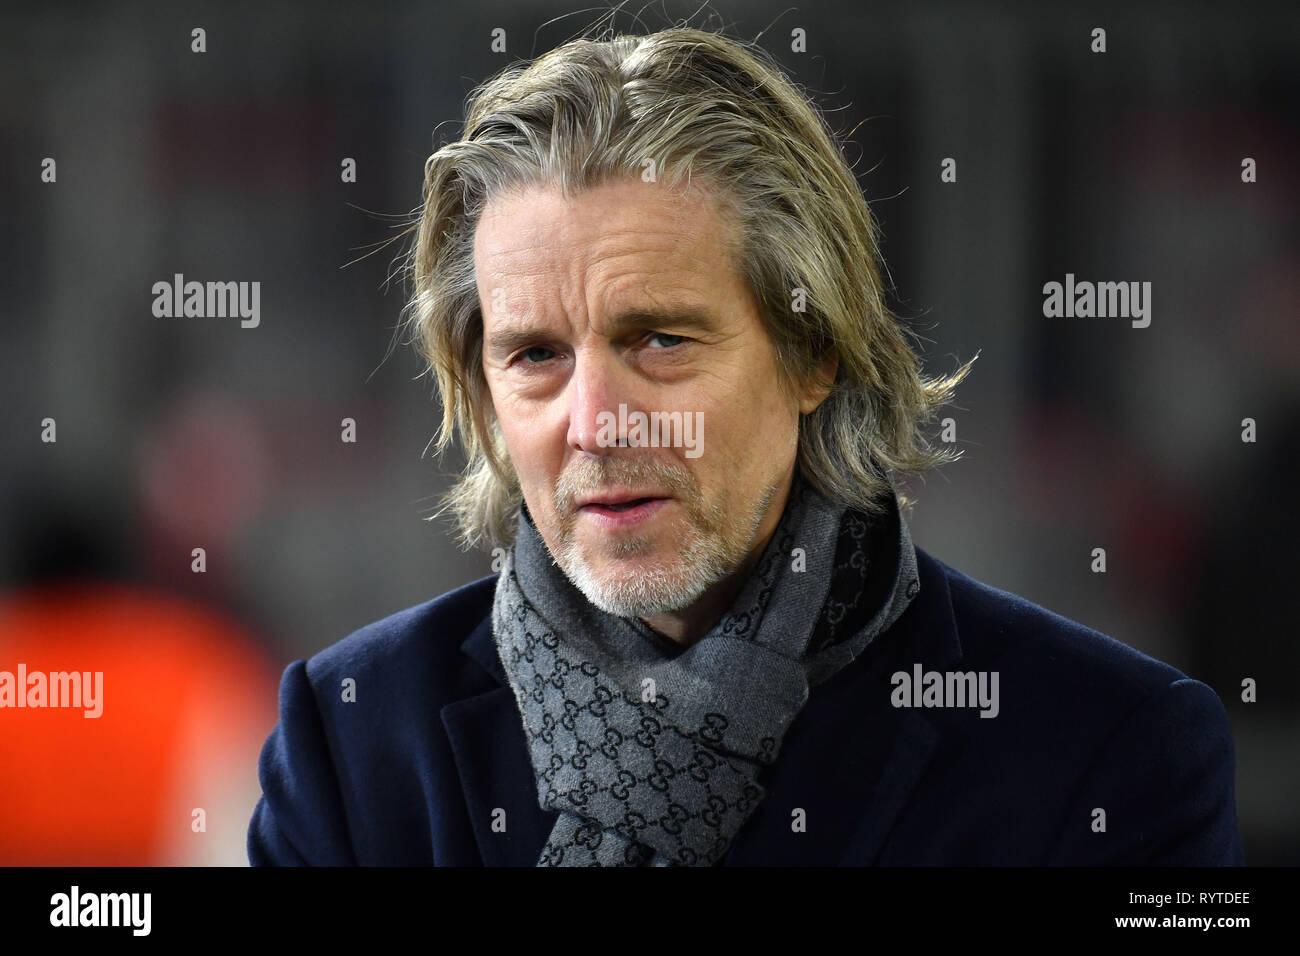 Jan Alter Fjortoft Sky Fussball Reporter Ex Fussball Spieler